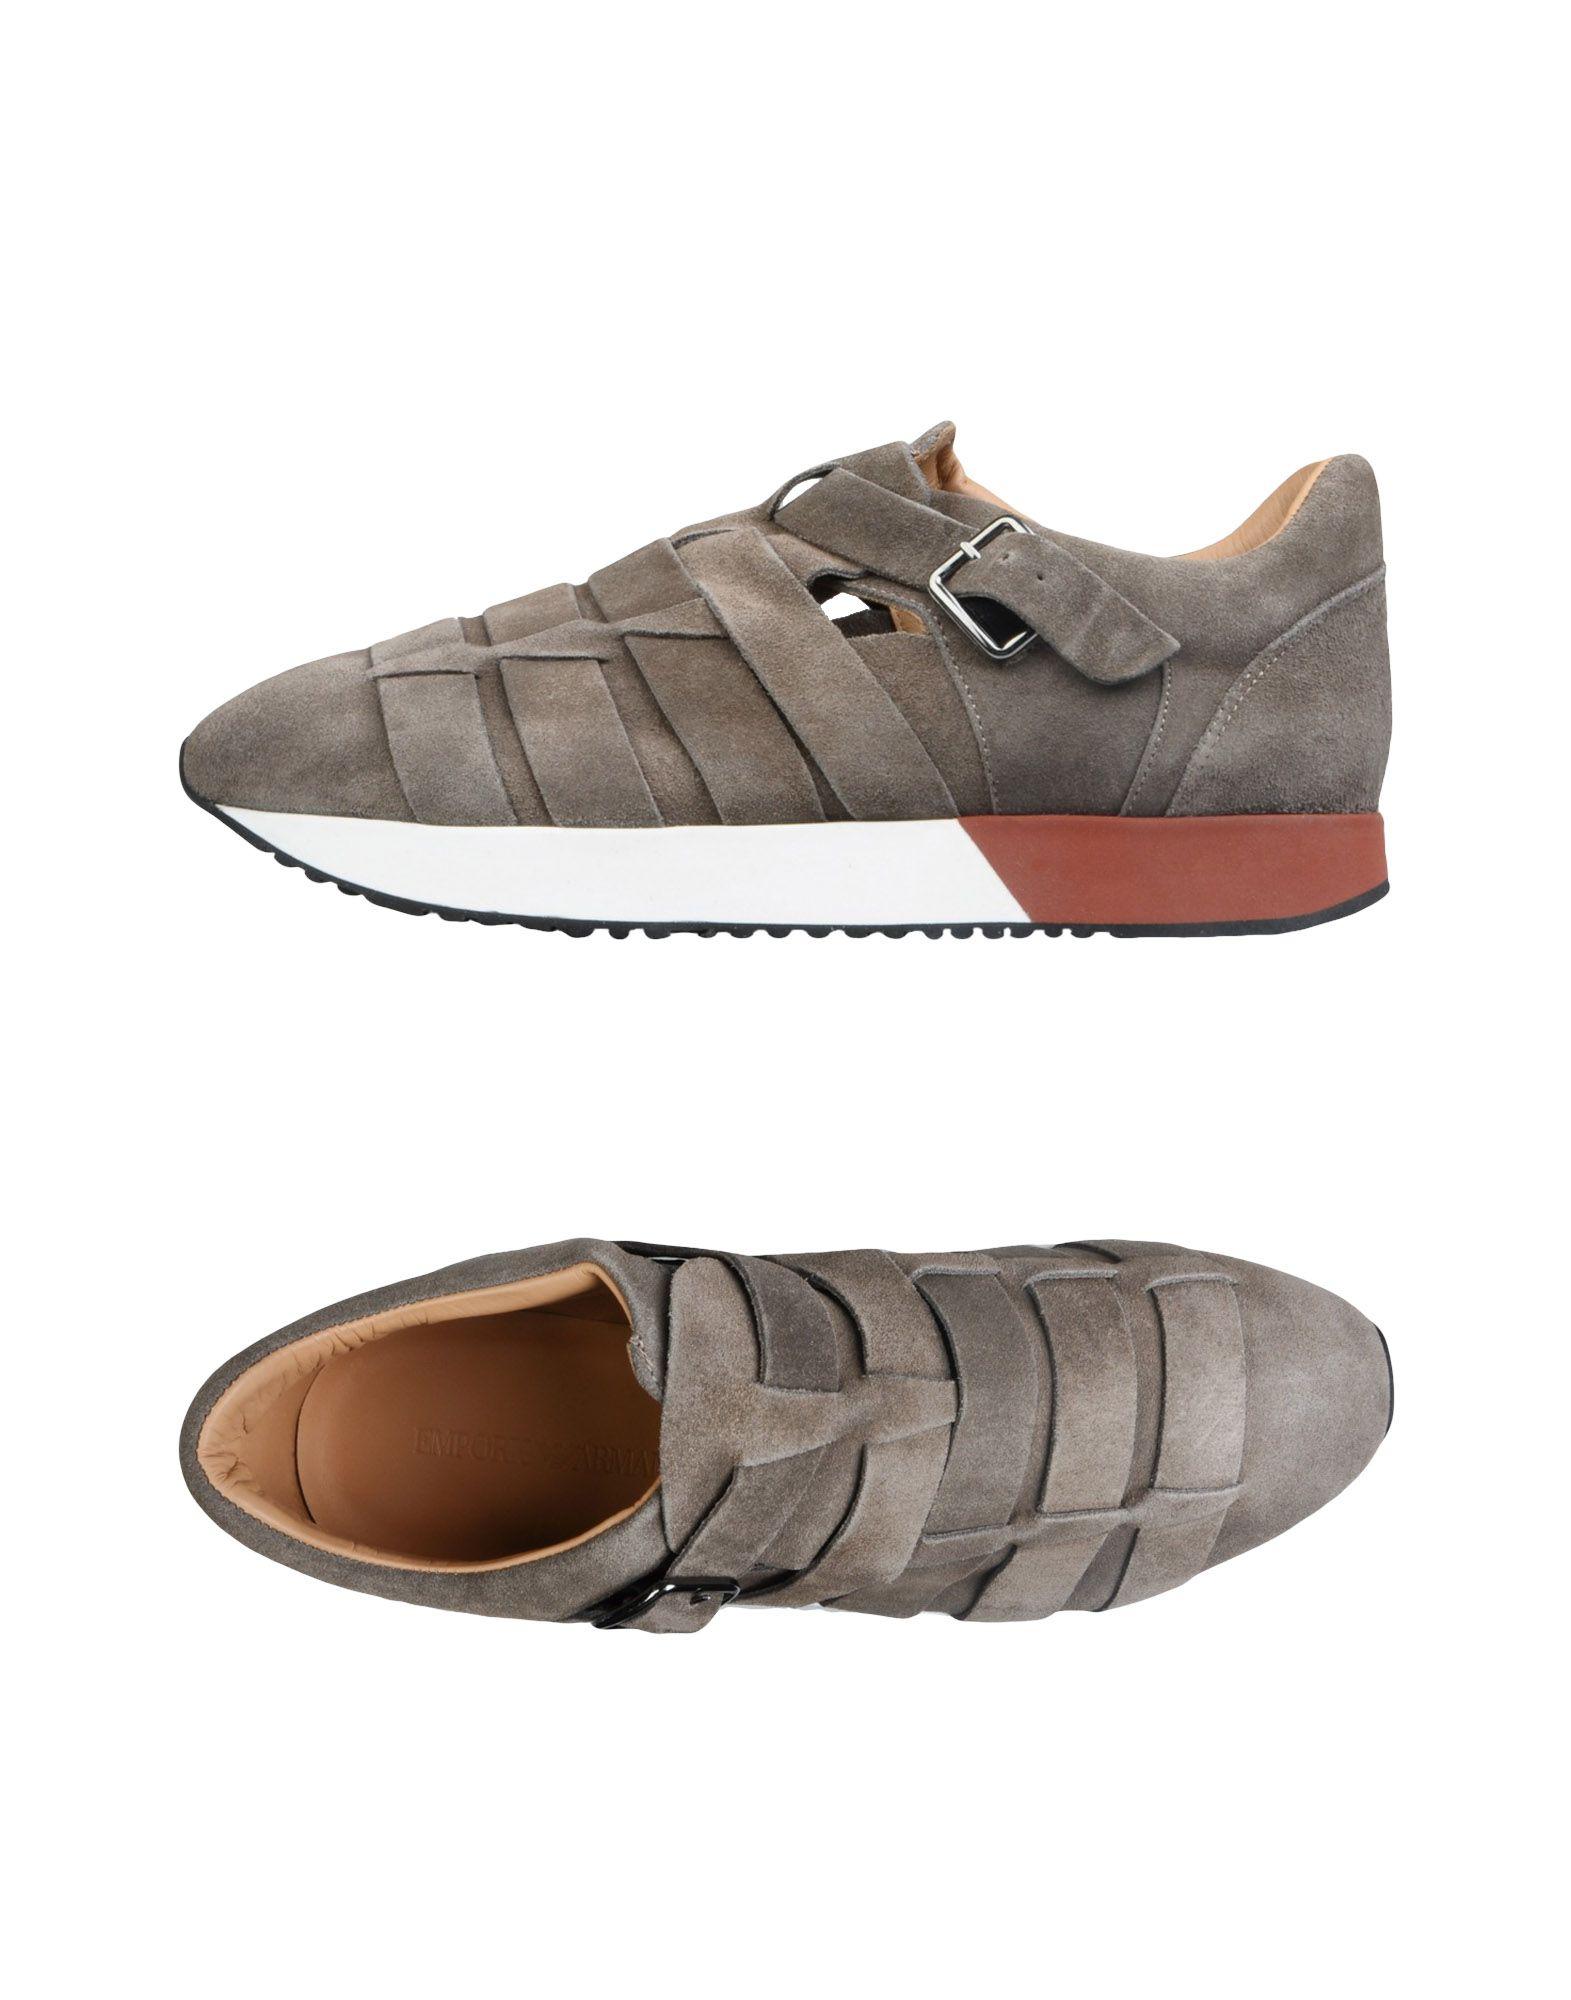 Emporio Sneakers Armani Sneakers Emporio Herren  11204254SP Neue Schuhe 4a7124